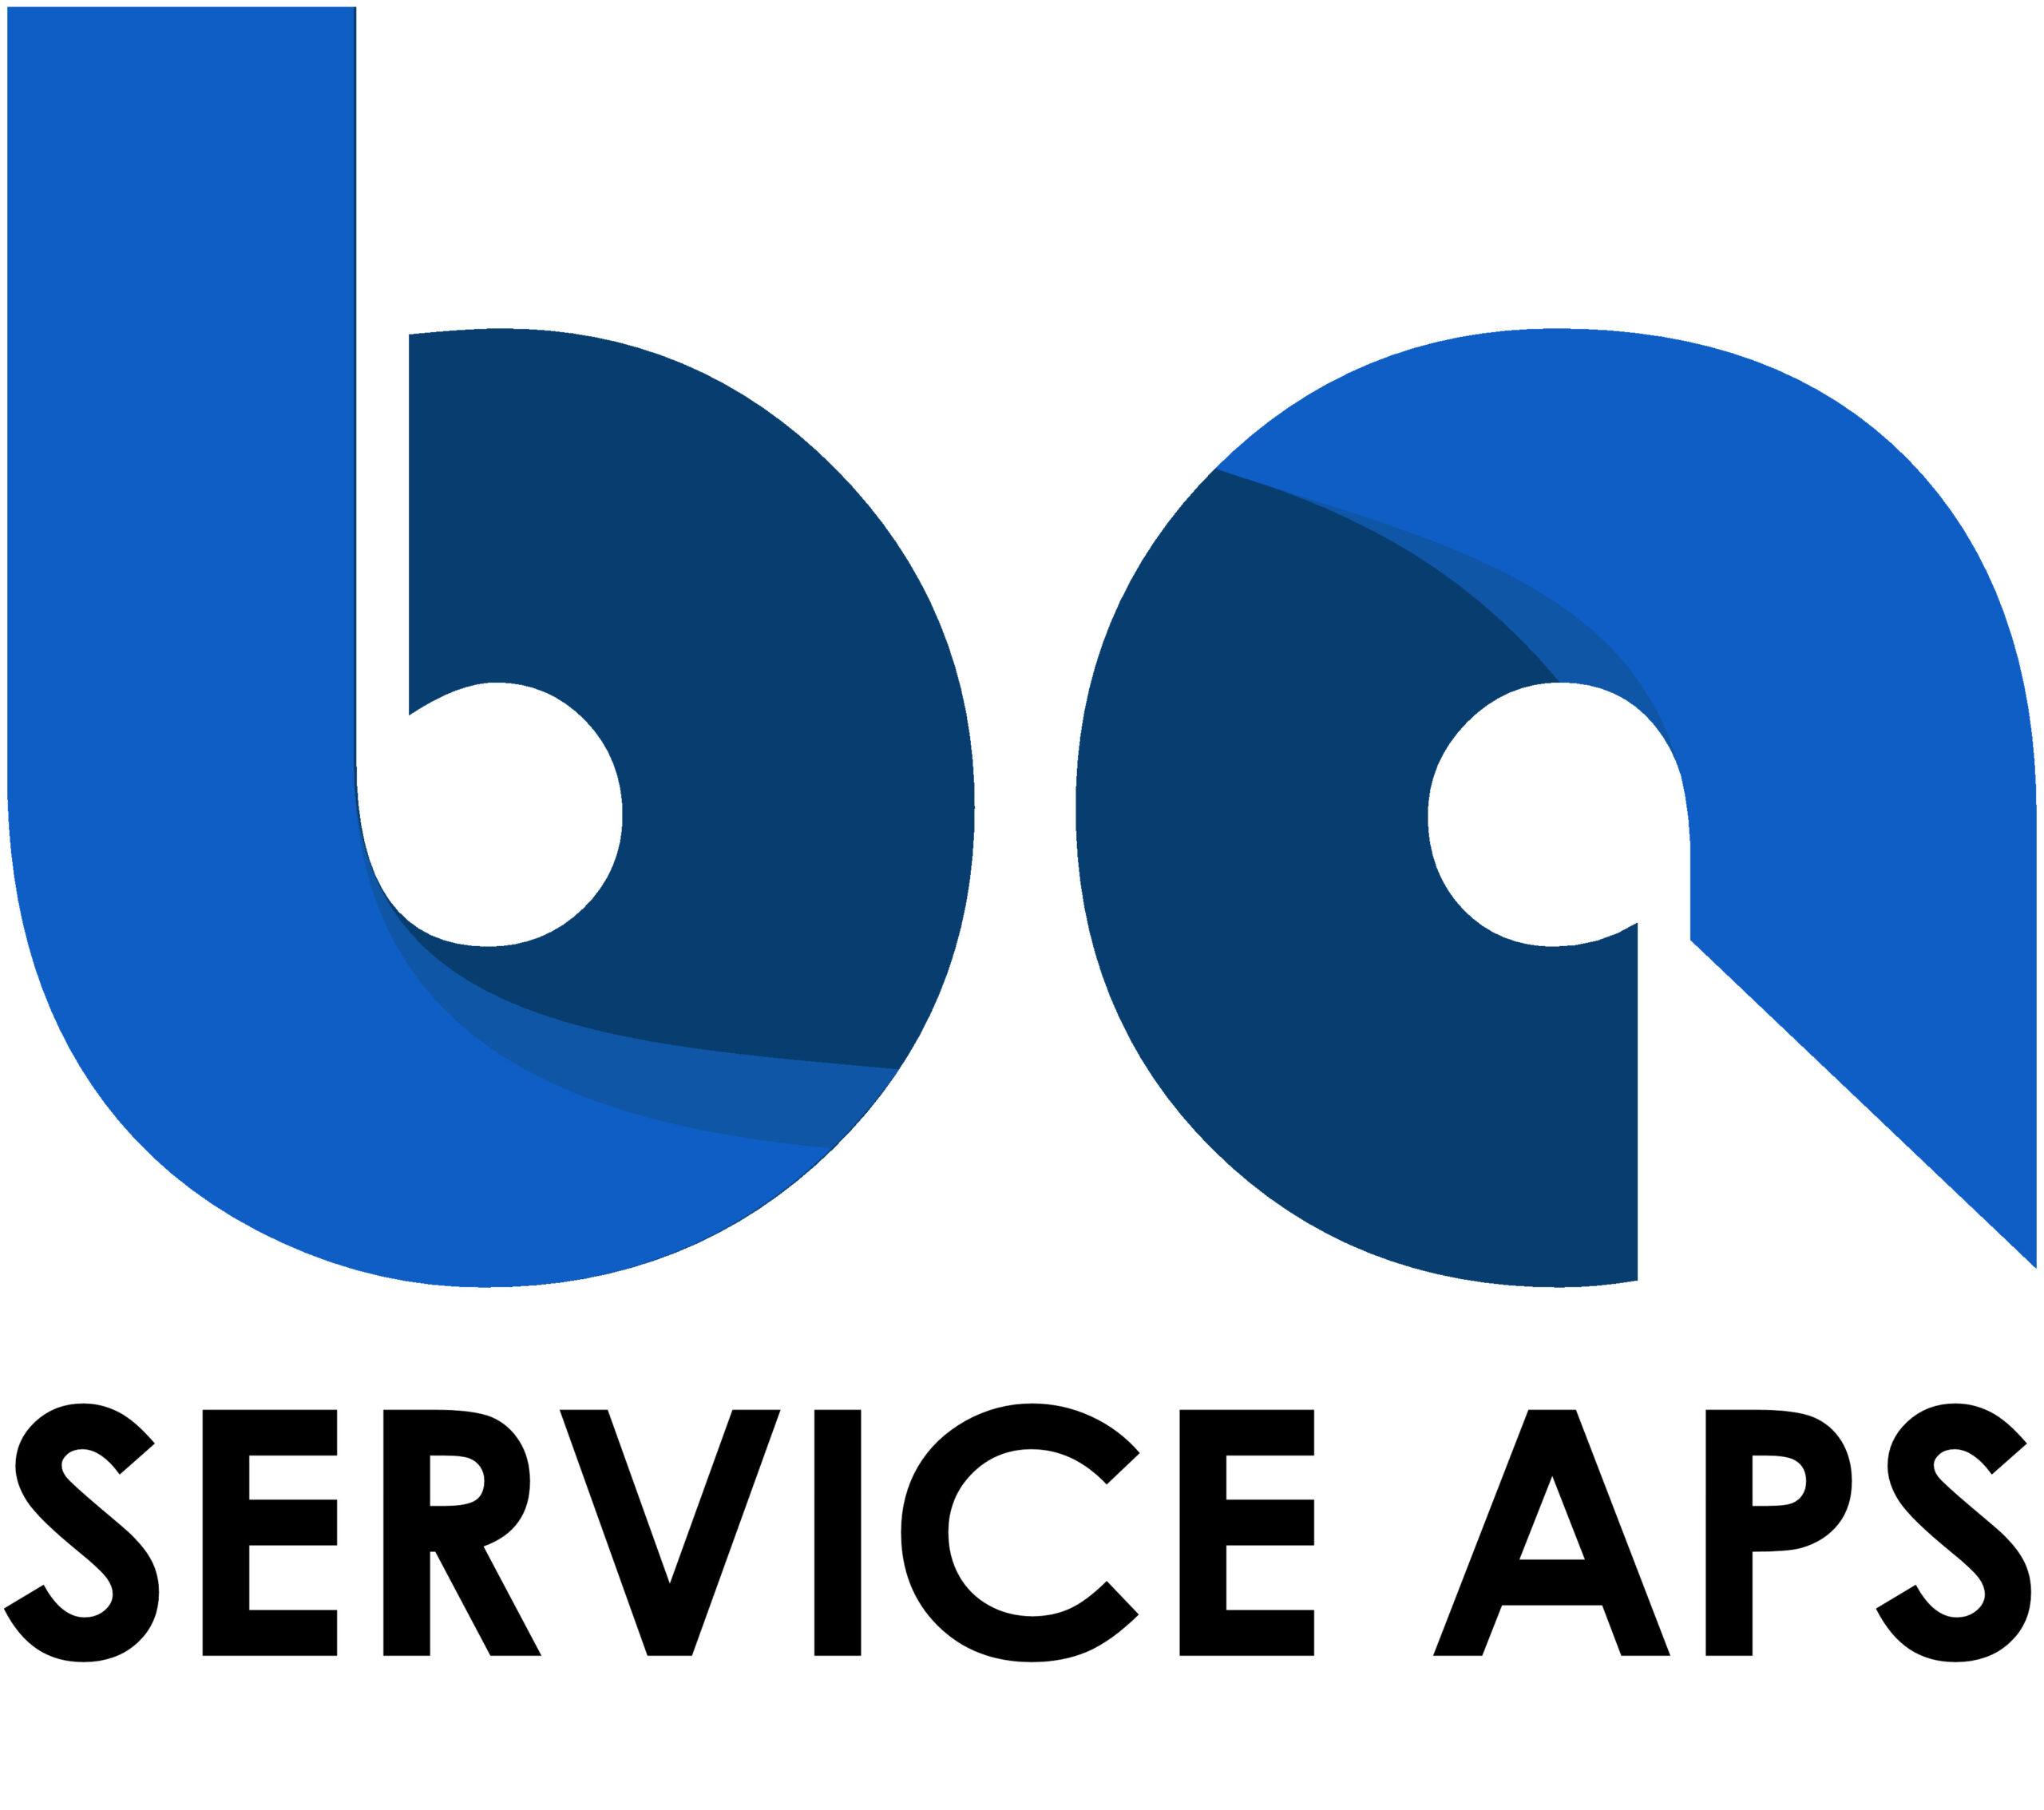 Ba-Service ApS